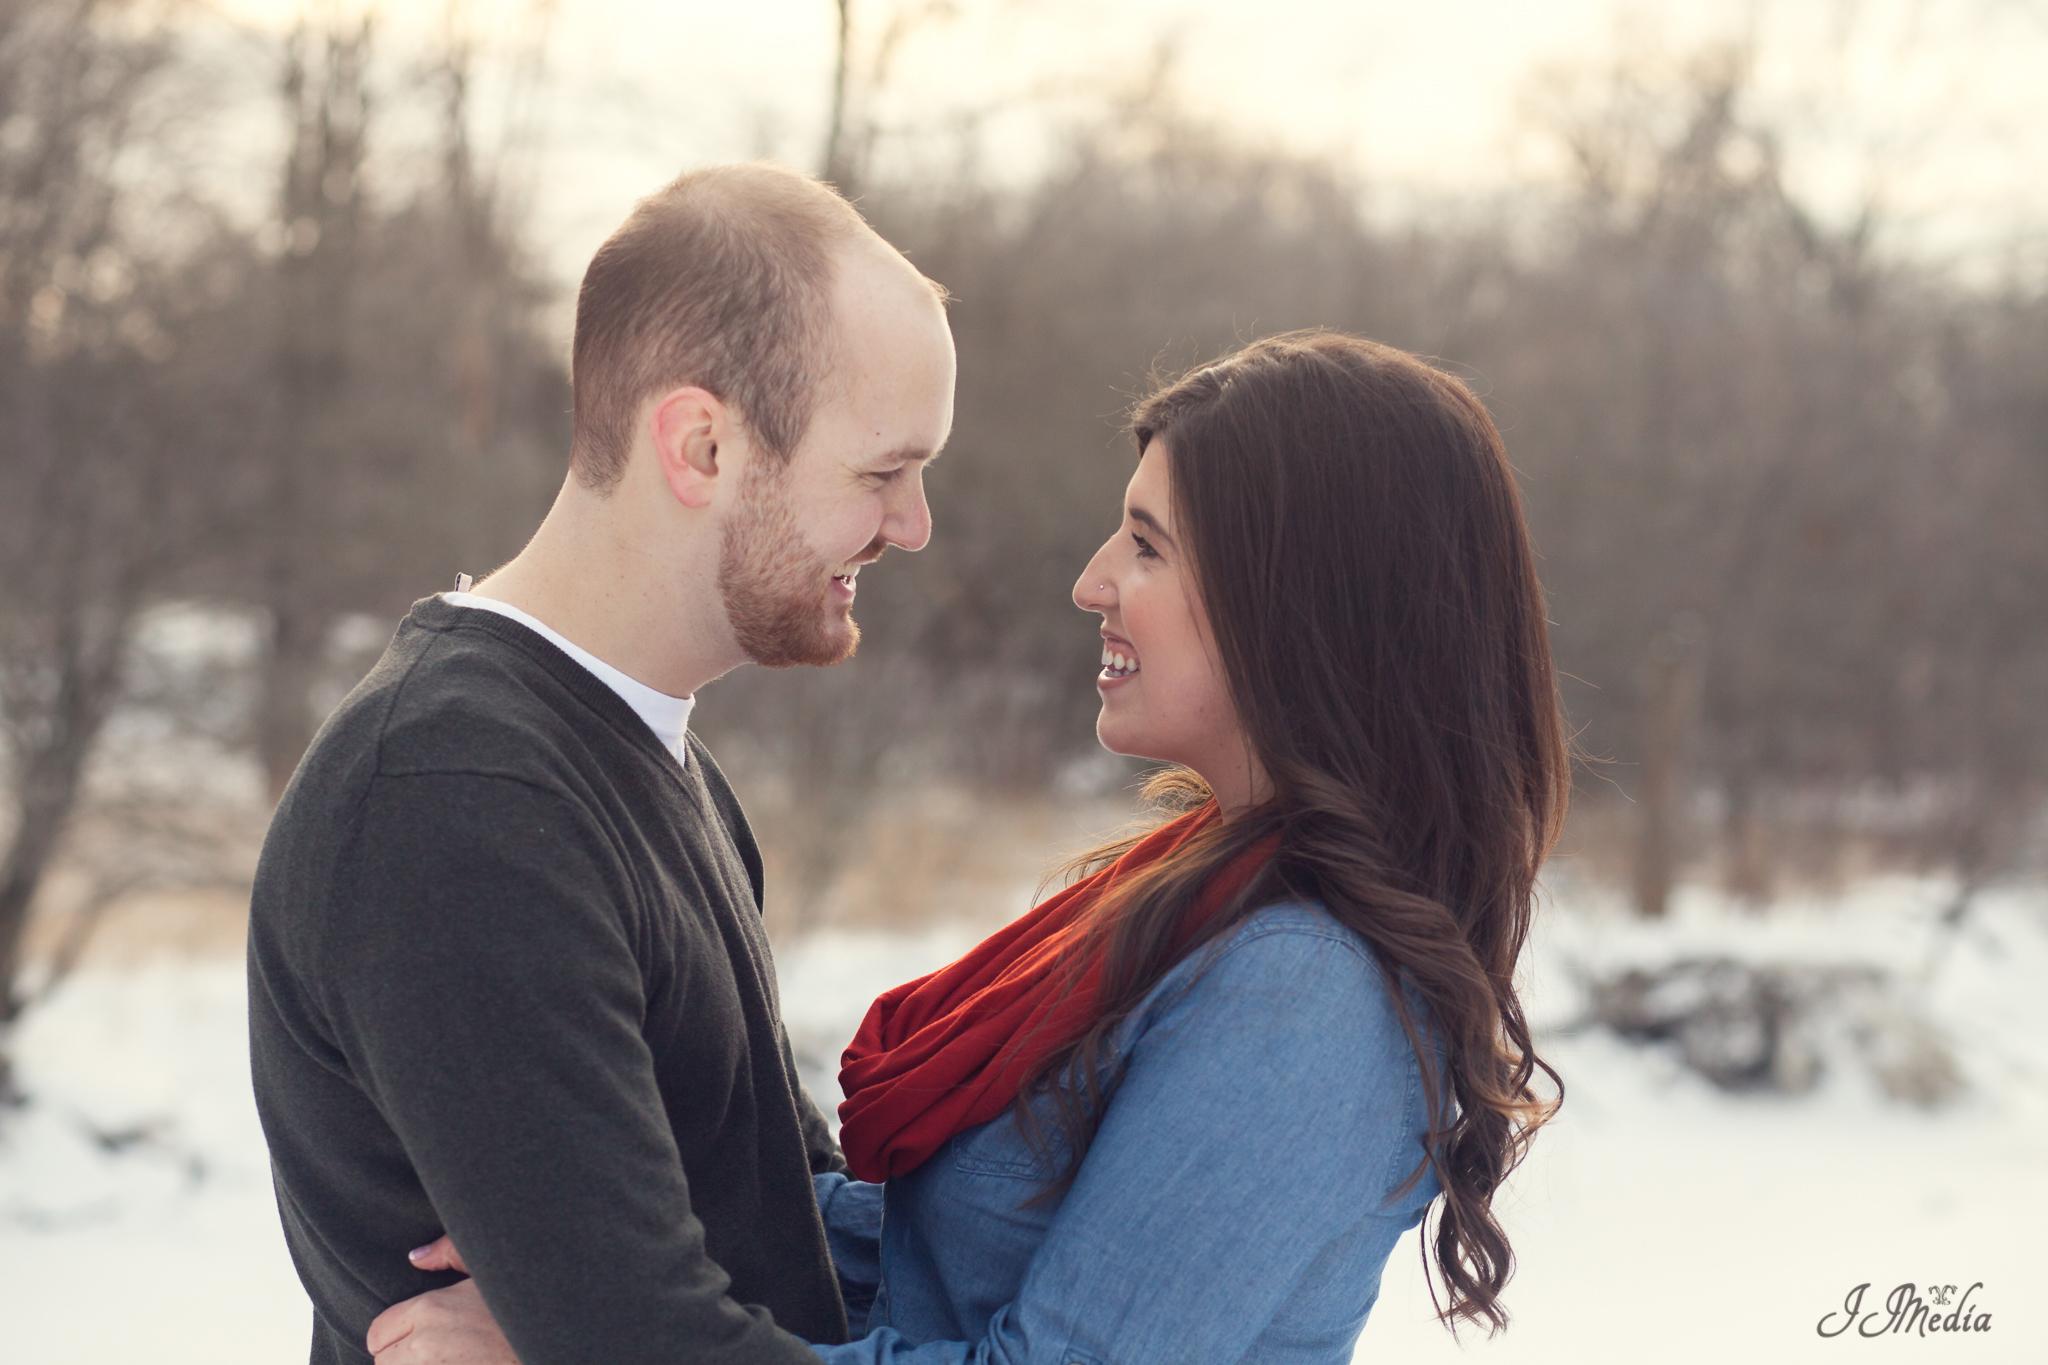 Winter-Engagement-Photos-JJMedia-1